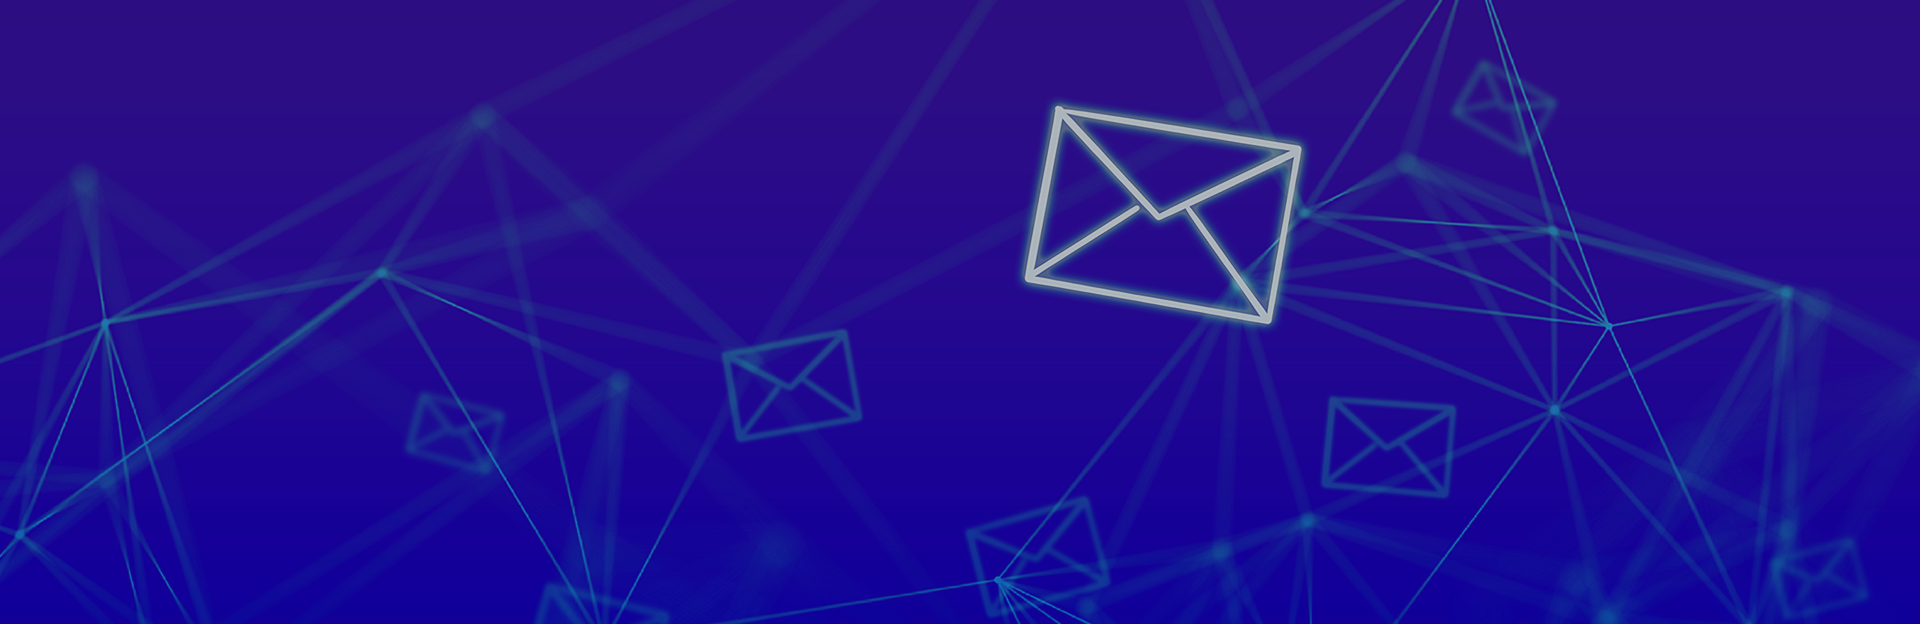 Email Security Image_1920x624-EN